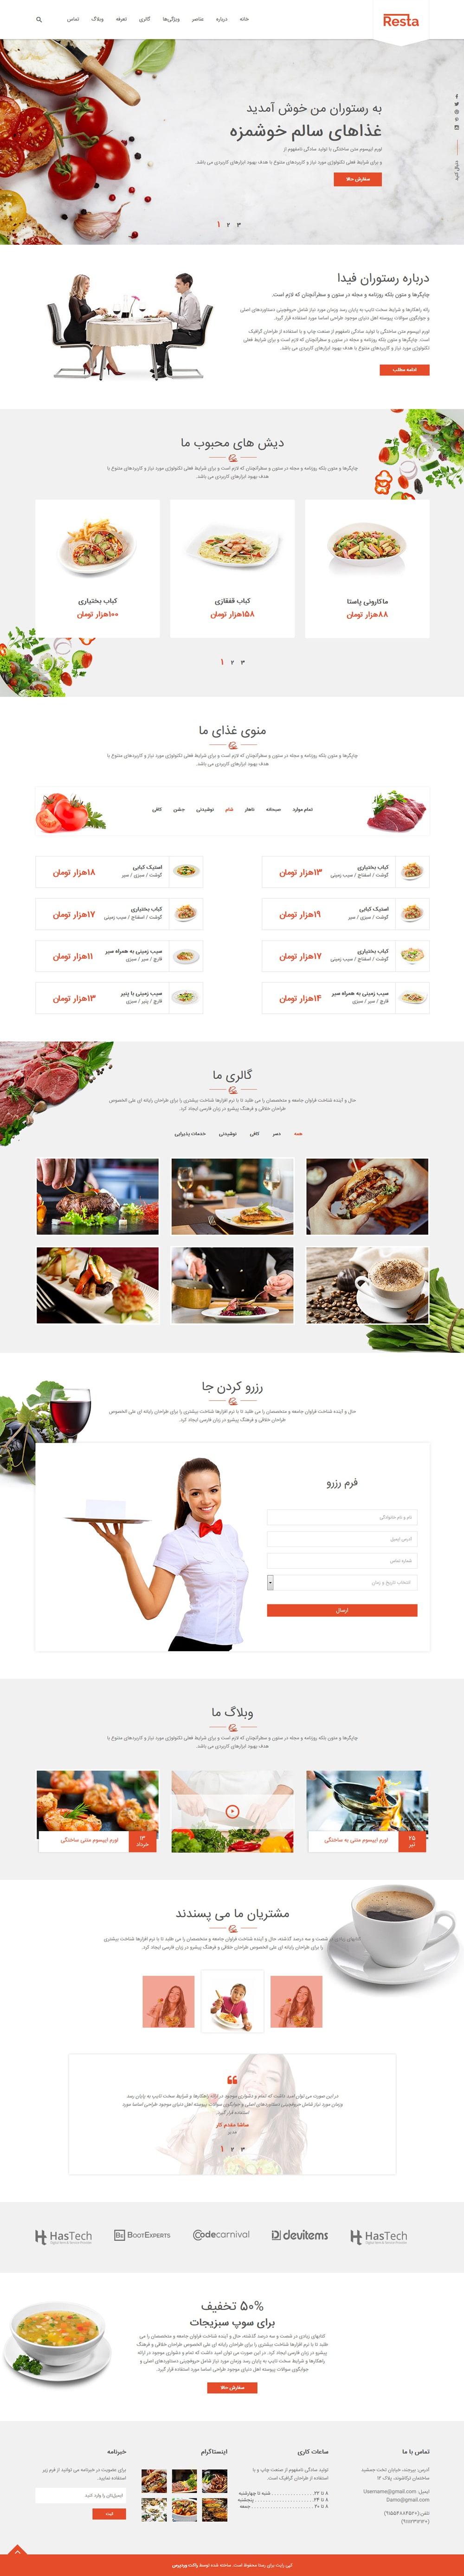 قالب Resta (رستا) پوسته HTML چند صفحه ای رستوران